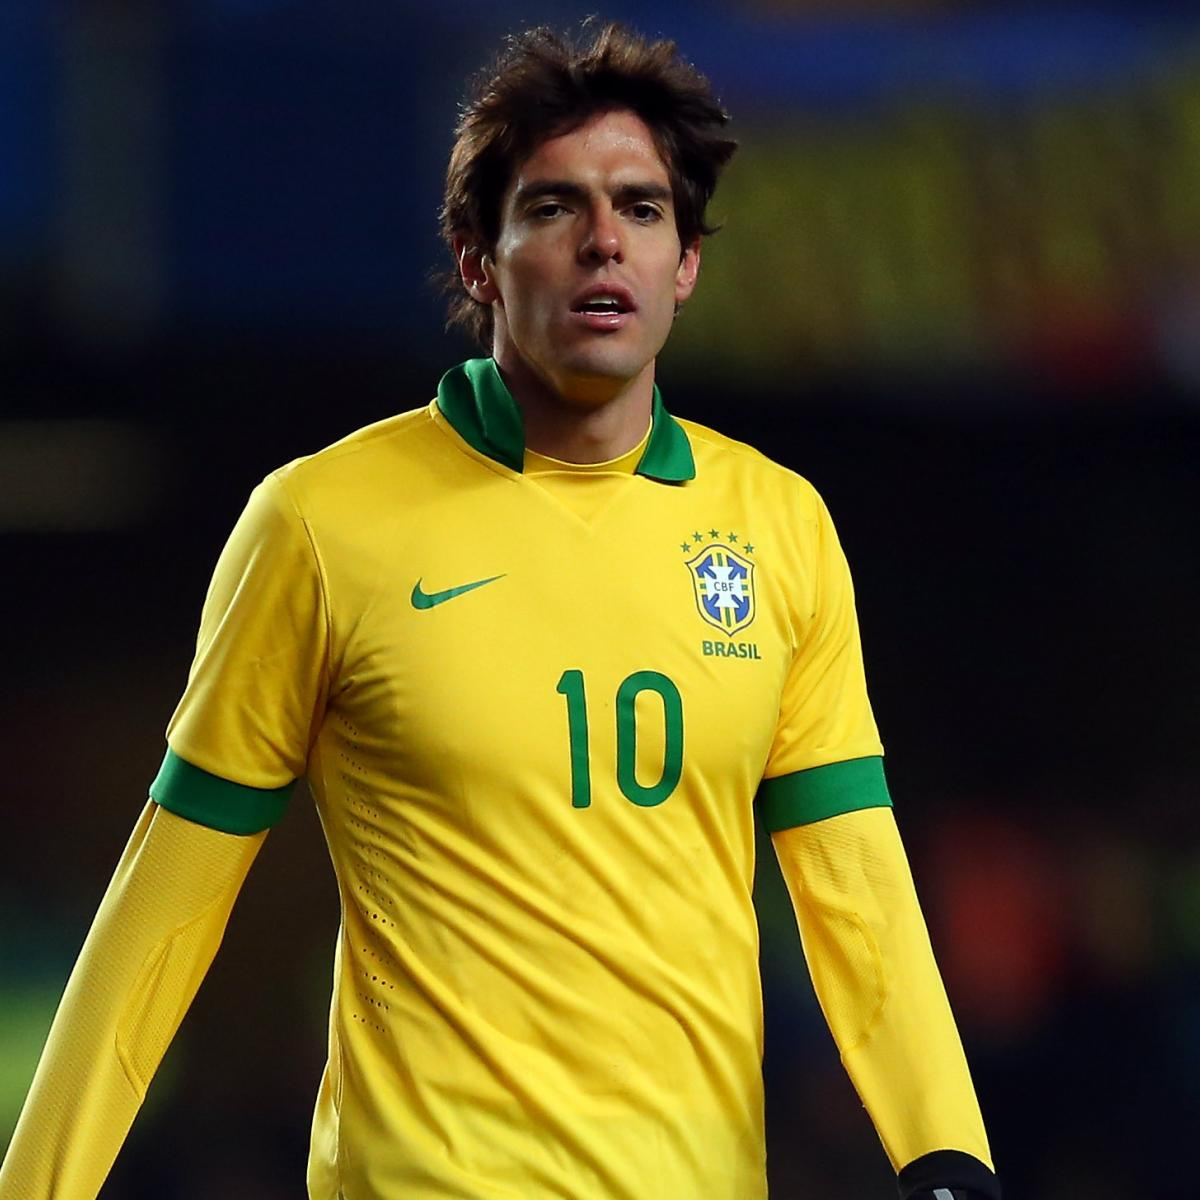 Kaka Brazil: Kaka's Second Coming Could Lead To Brazil Return For 2014